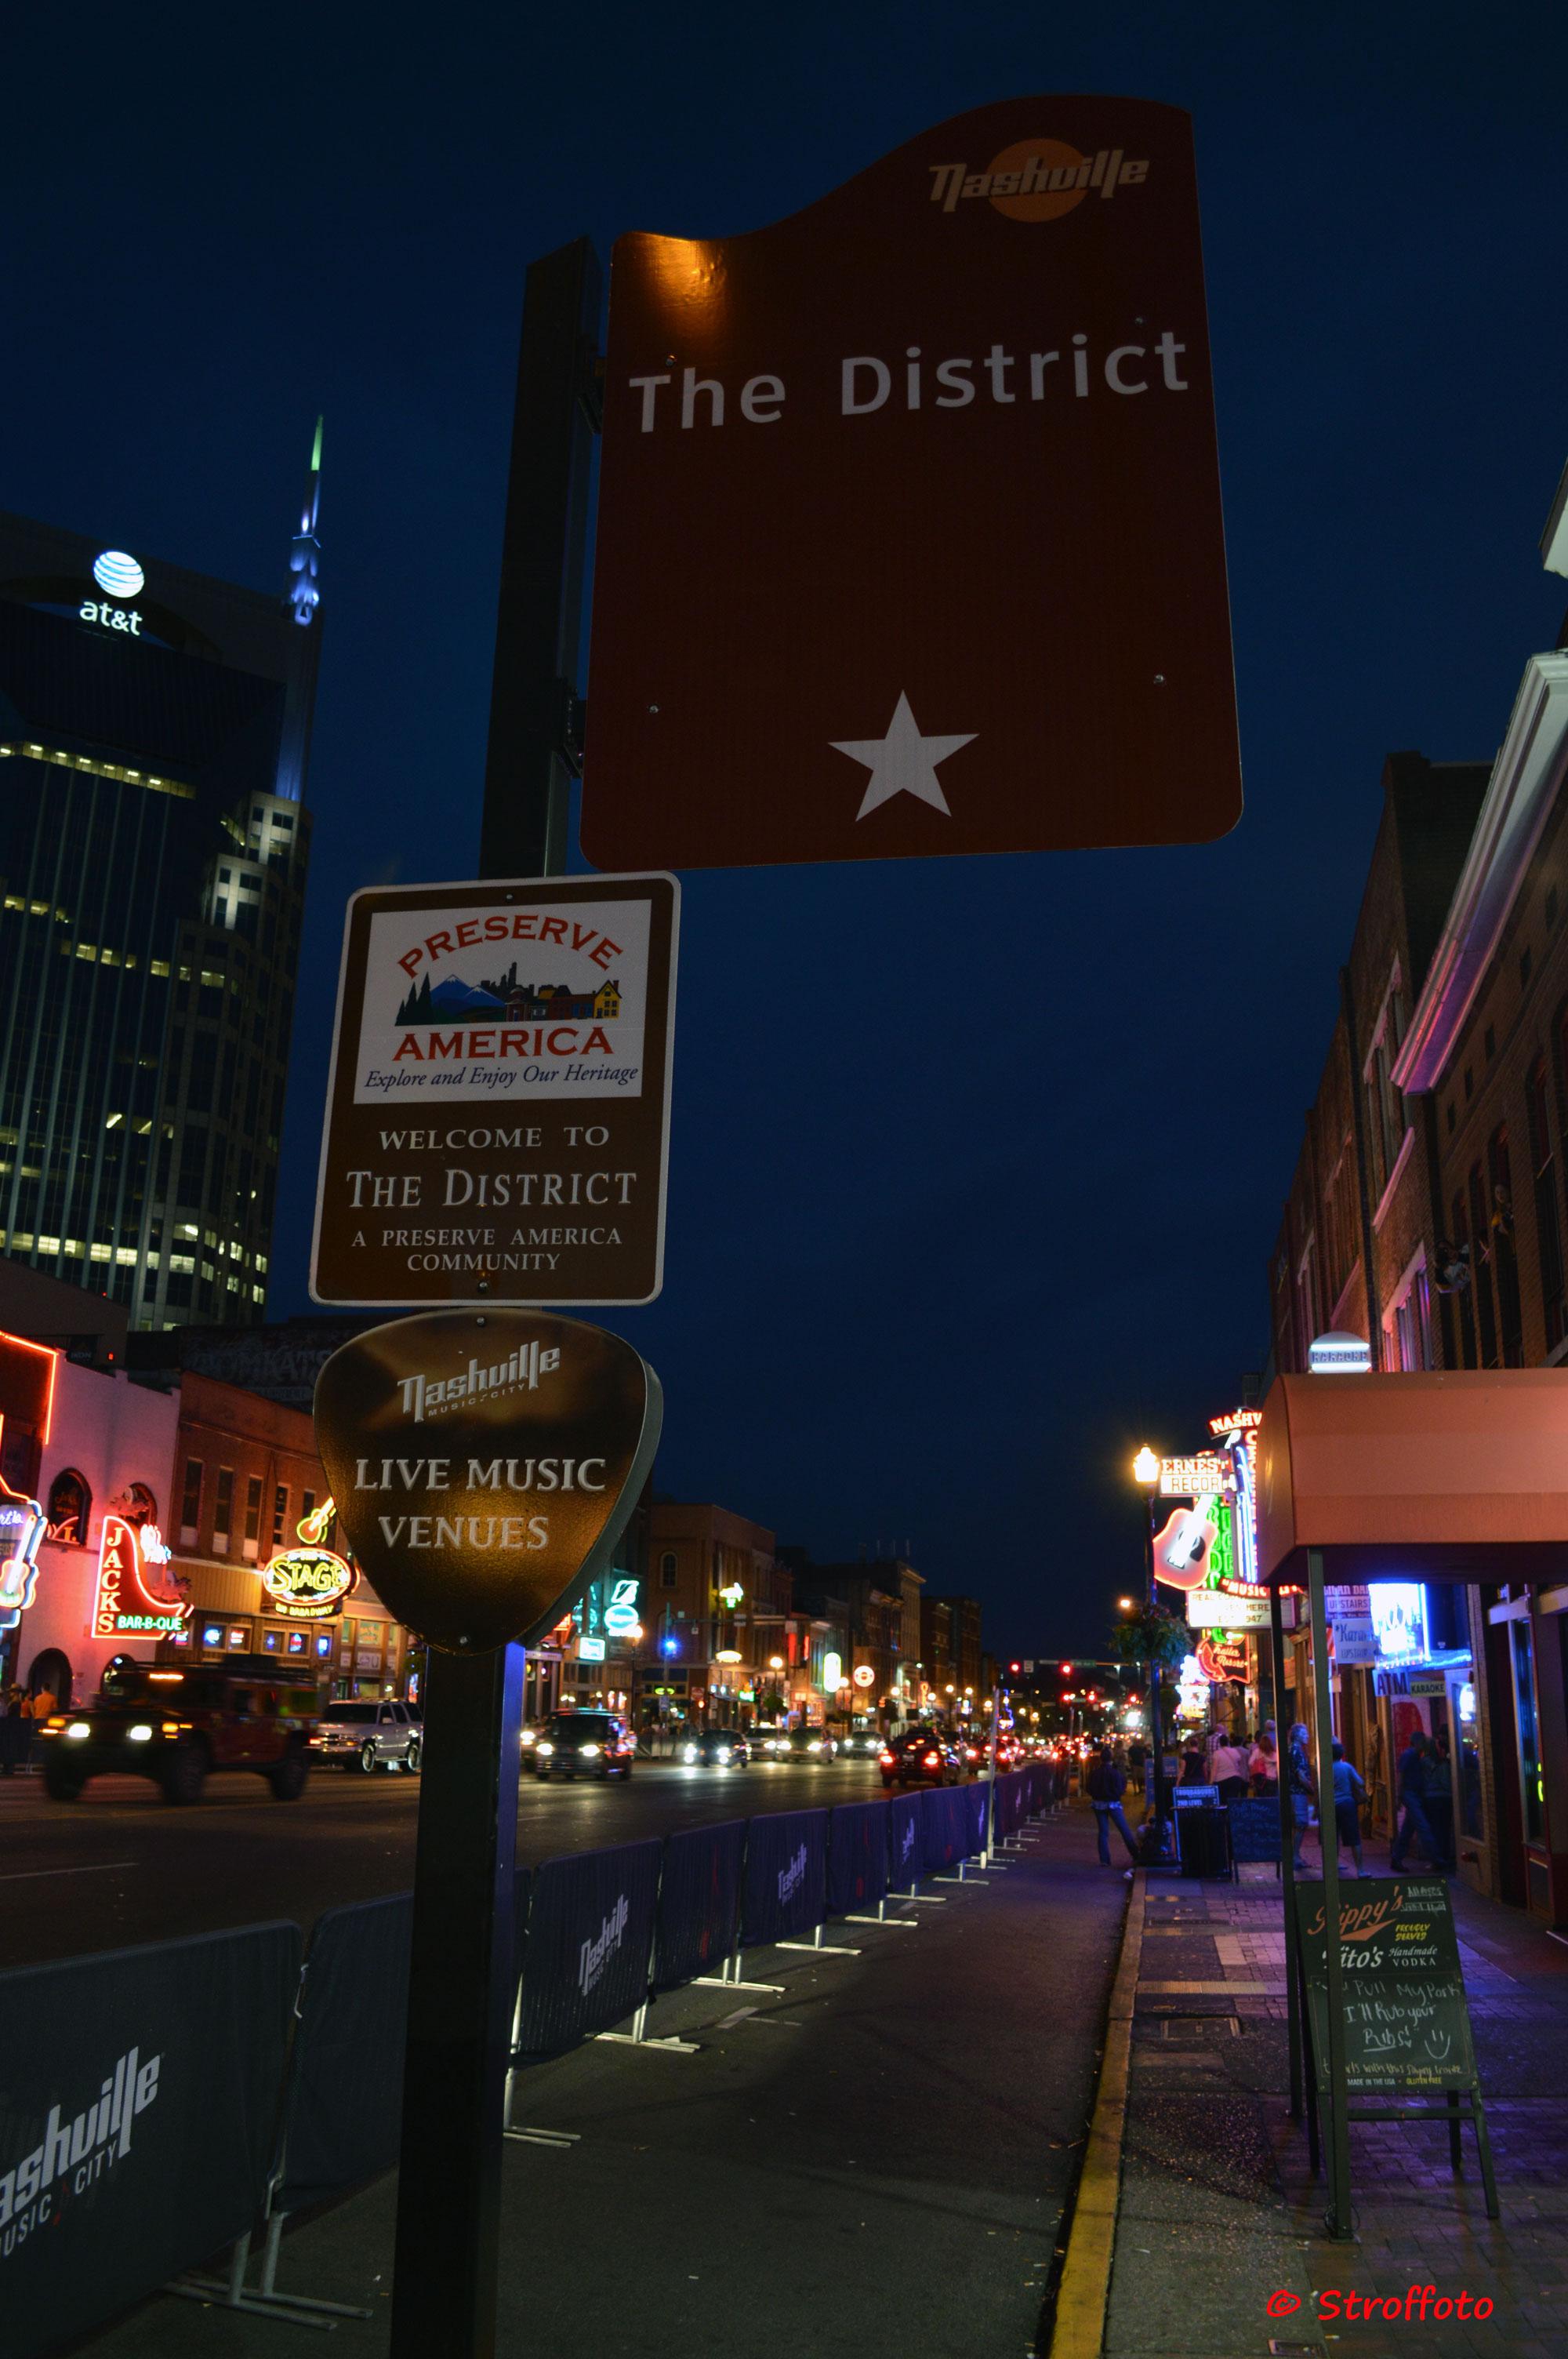 Broadway in Nashville At Night